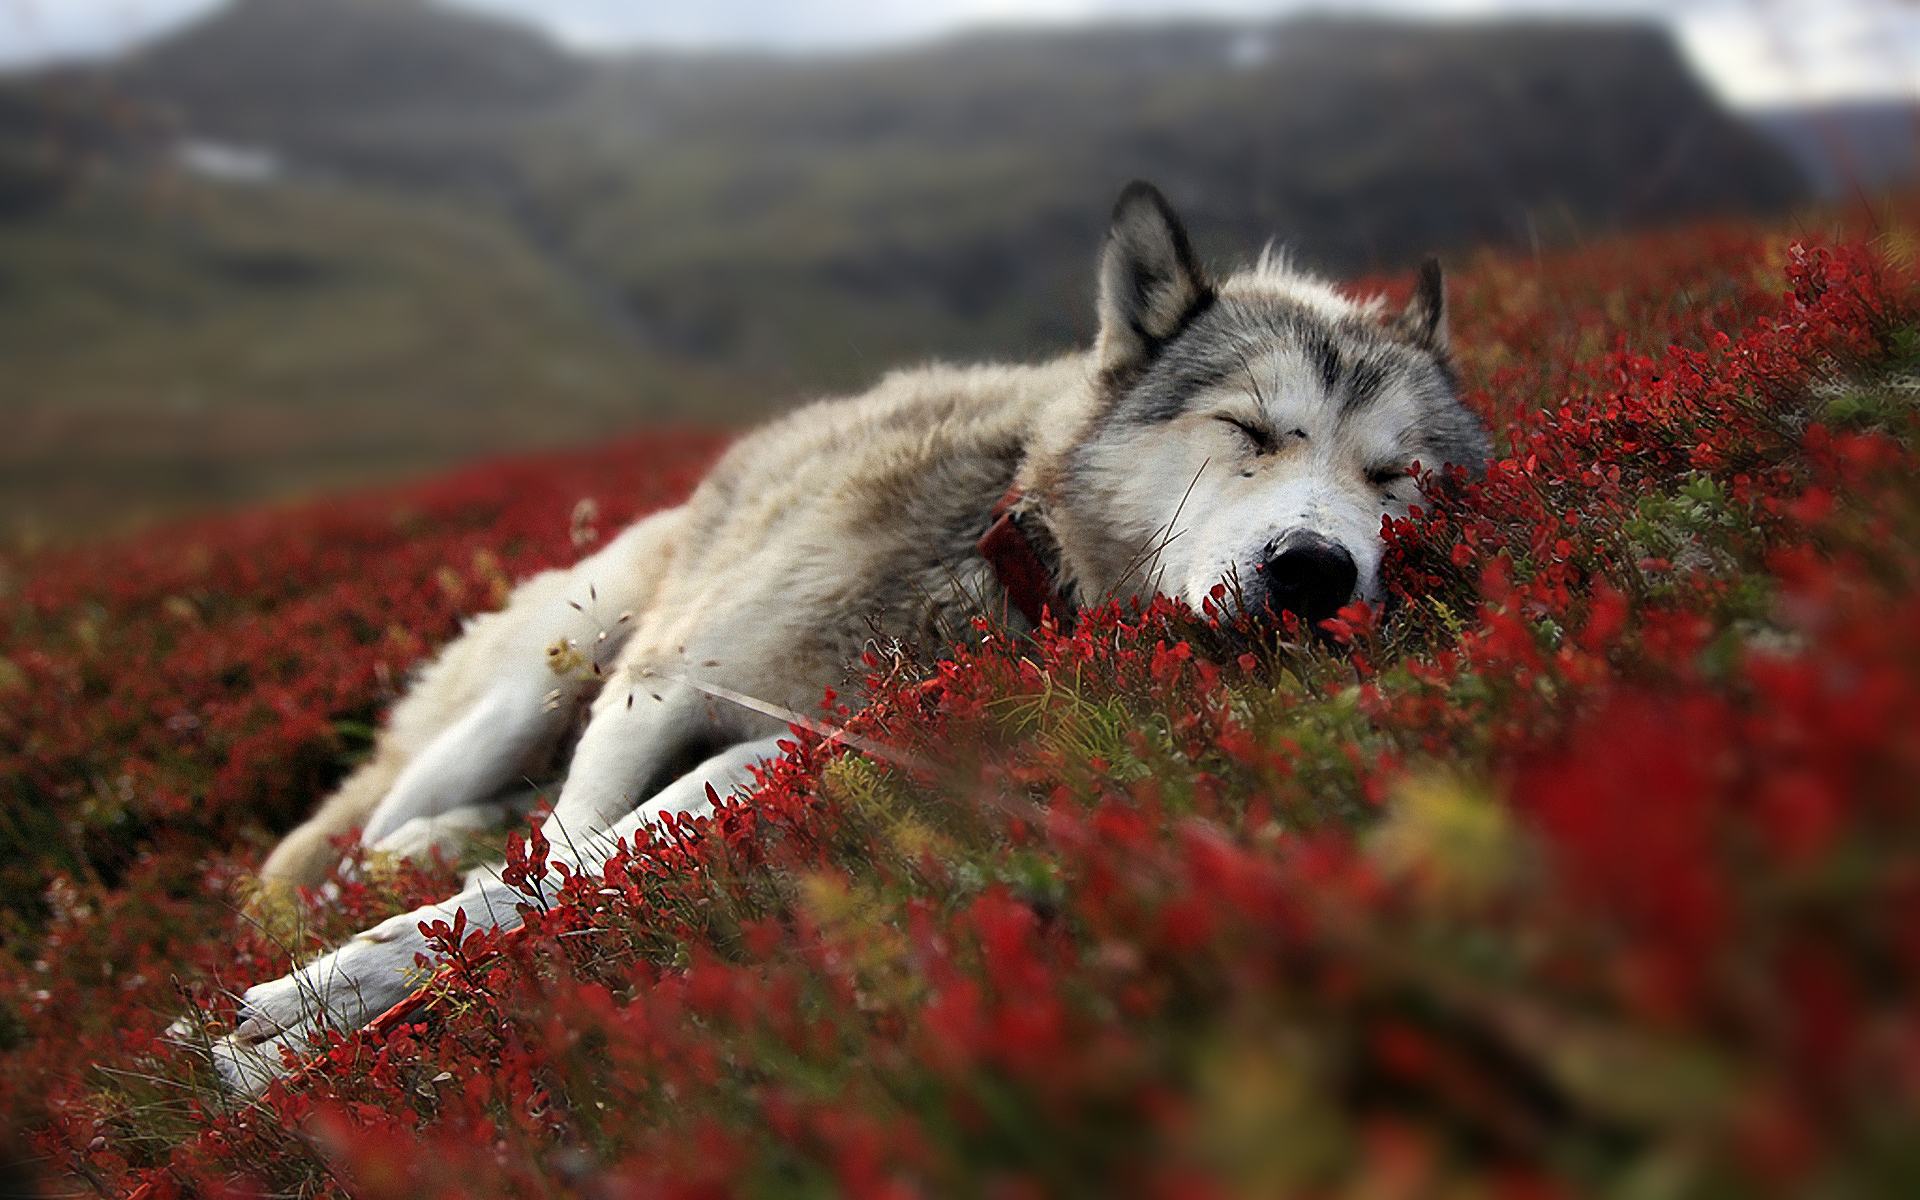 Wolf Wallpaper wolves 16120140 1920 1200 Wolf wallpaper wolves 1920x1200